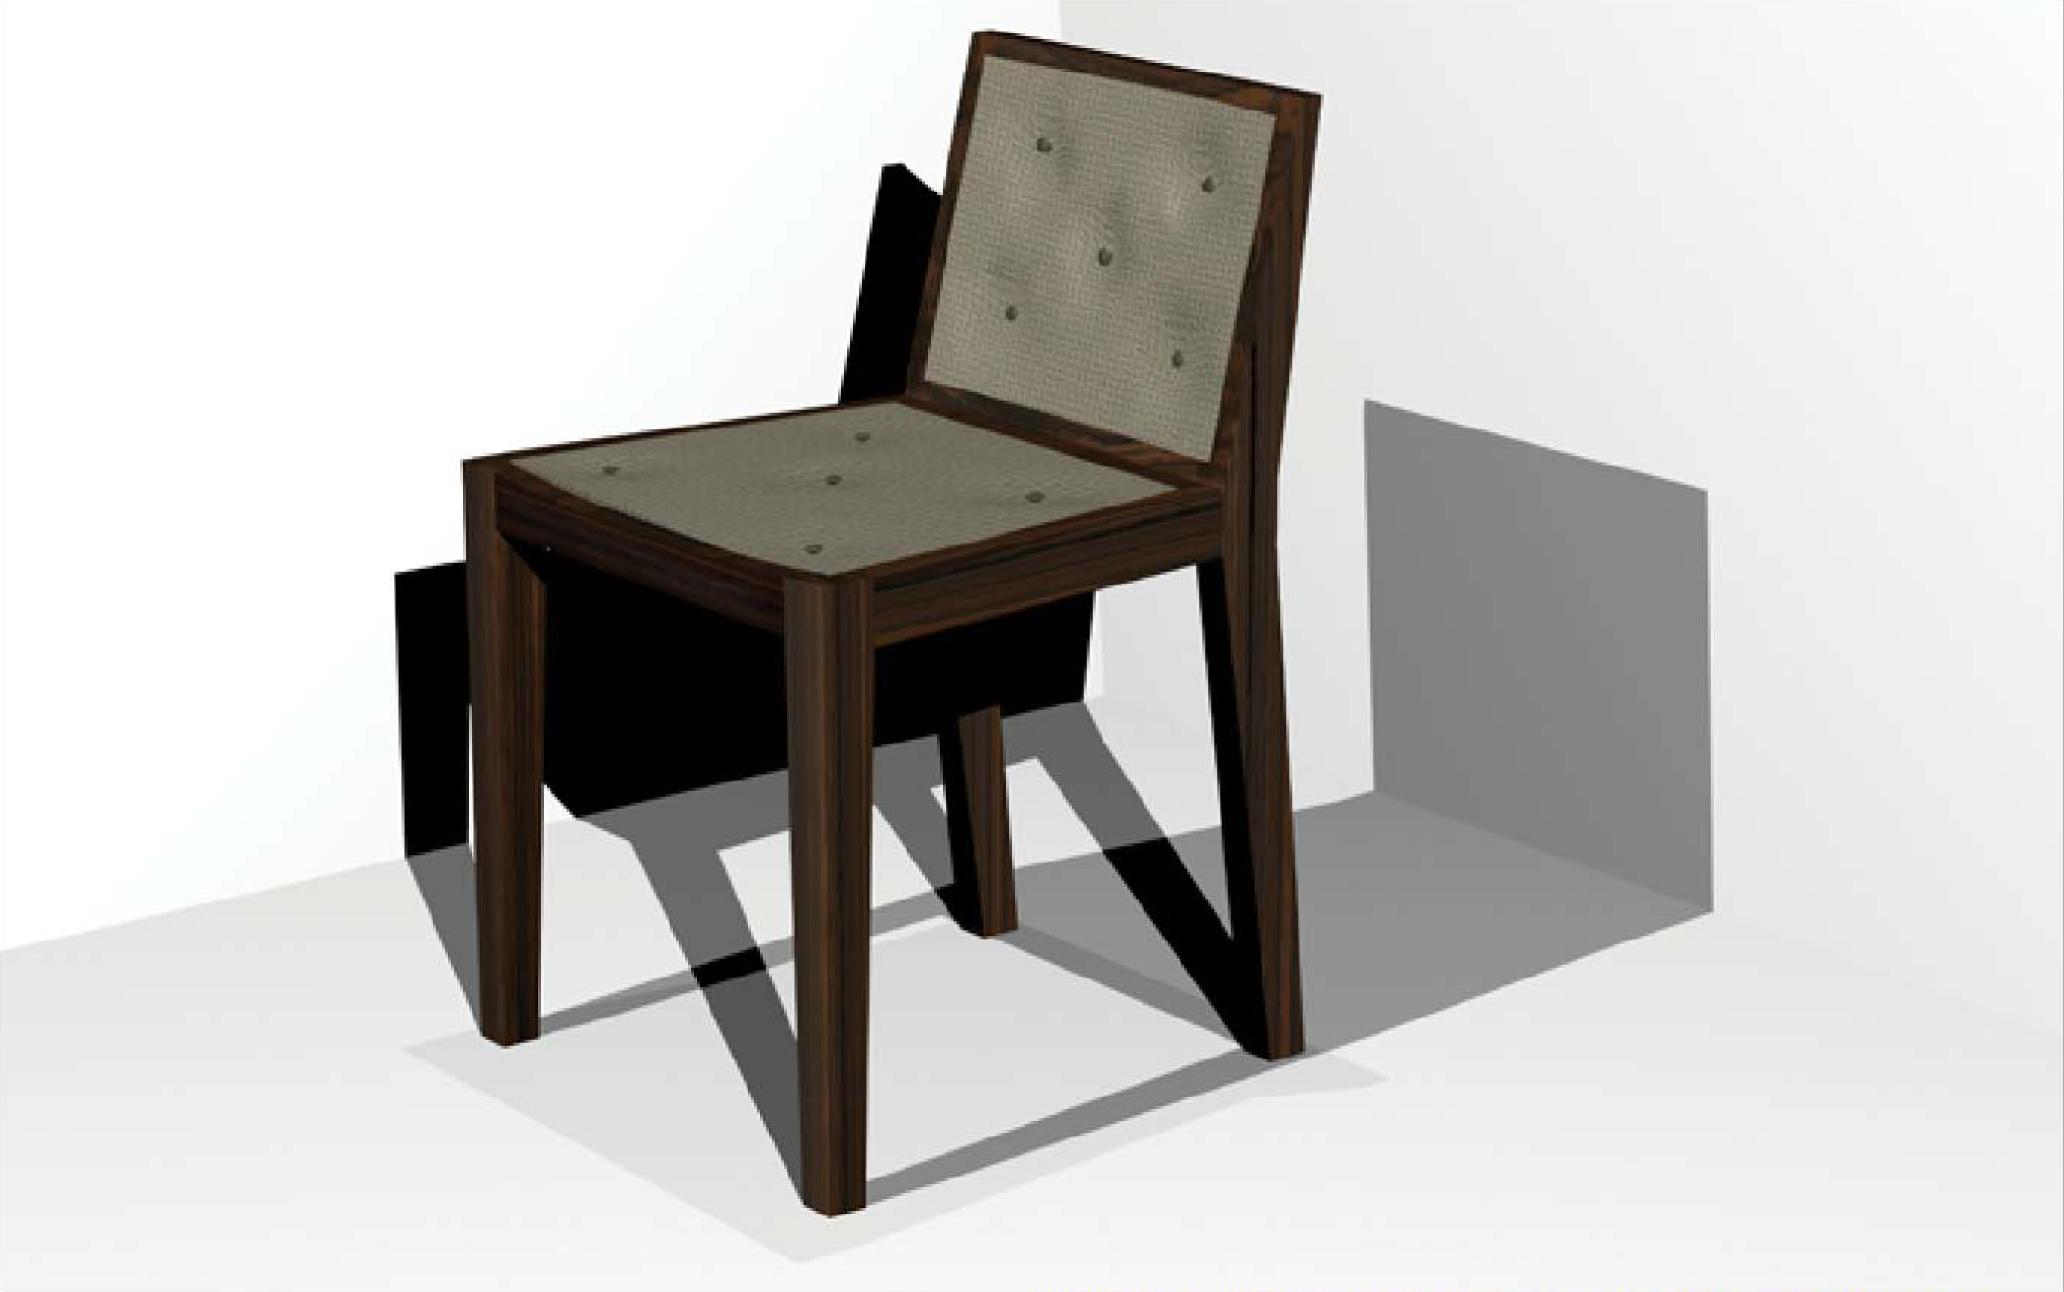 chair design portfolio wheelchair vehicle series 1 peripteral